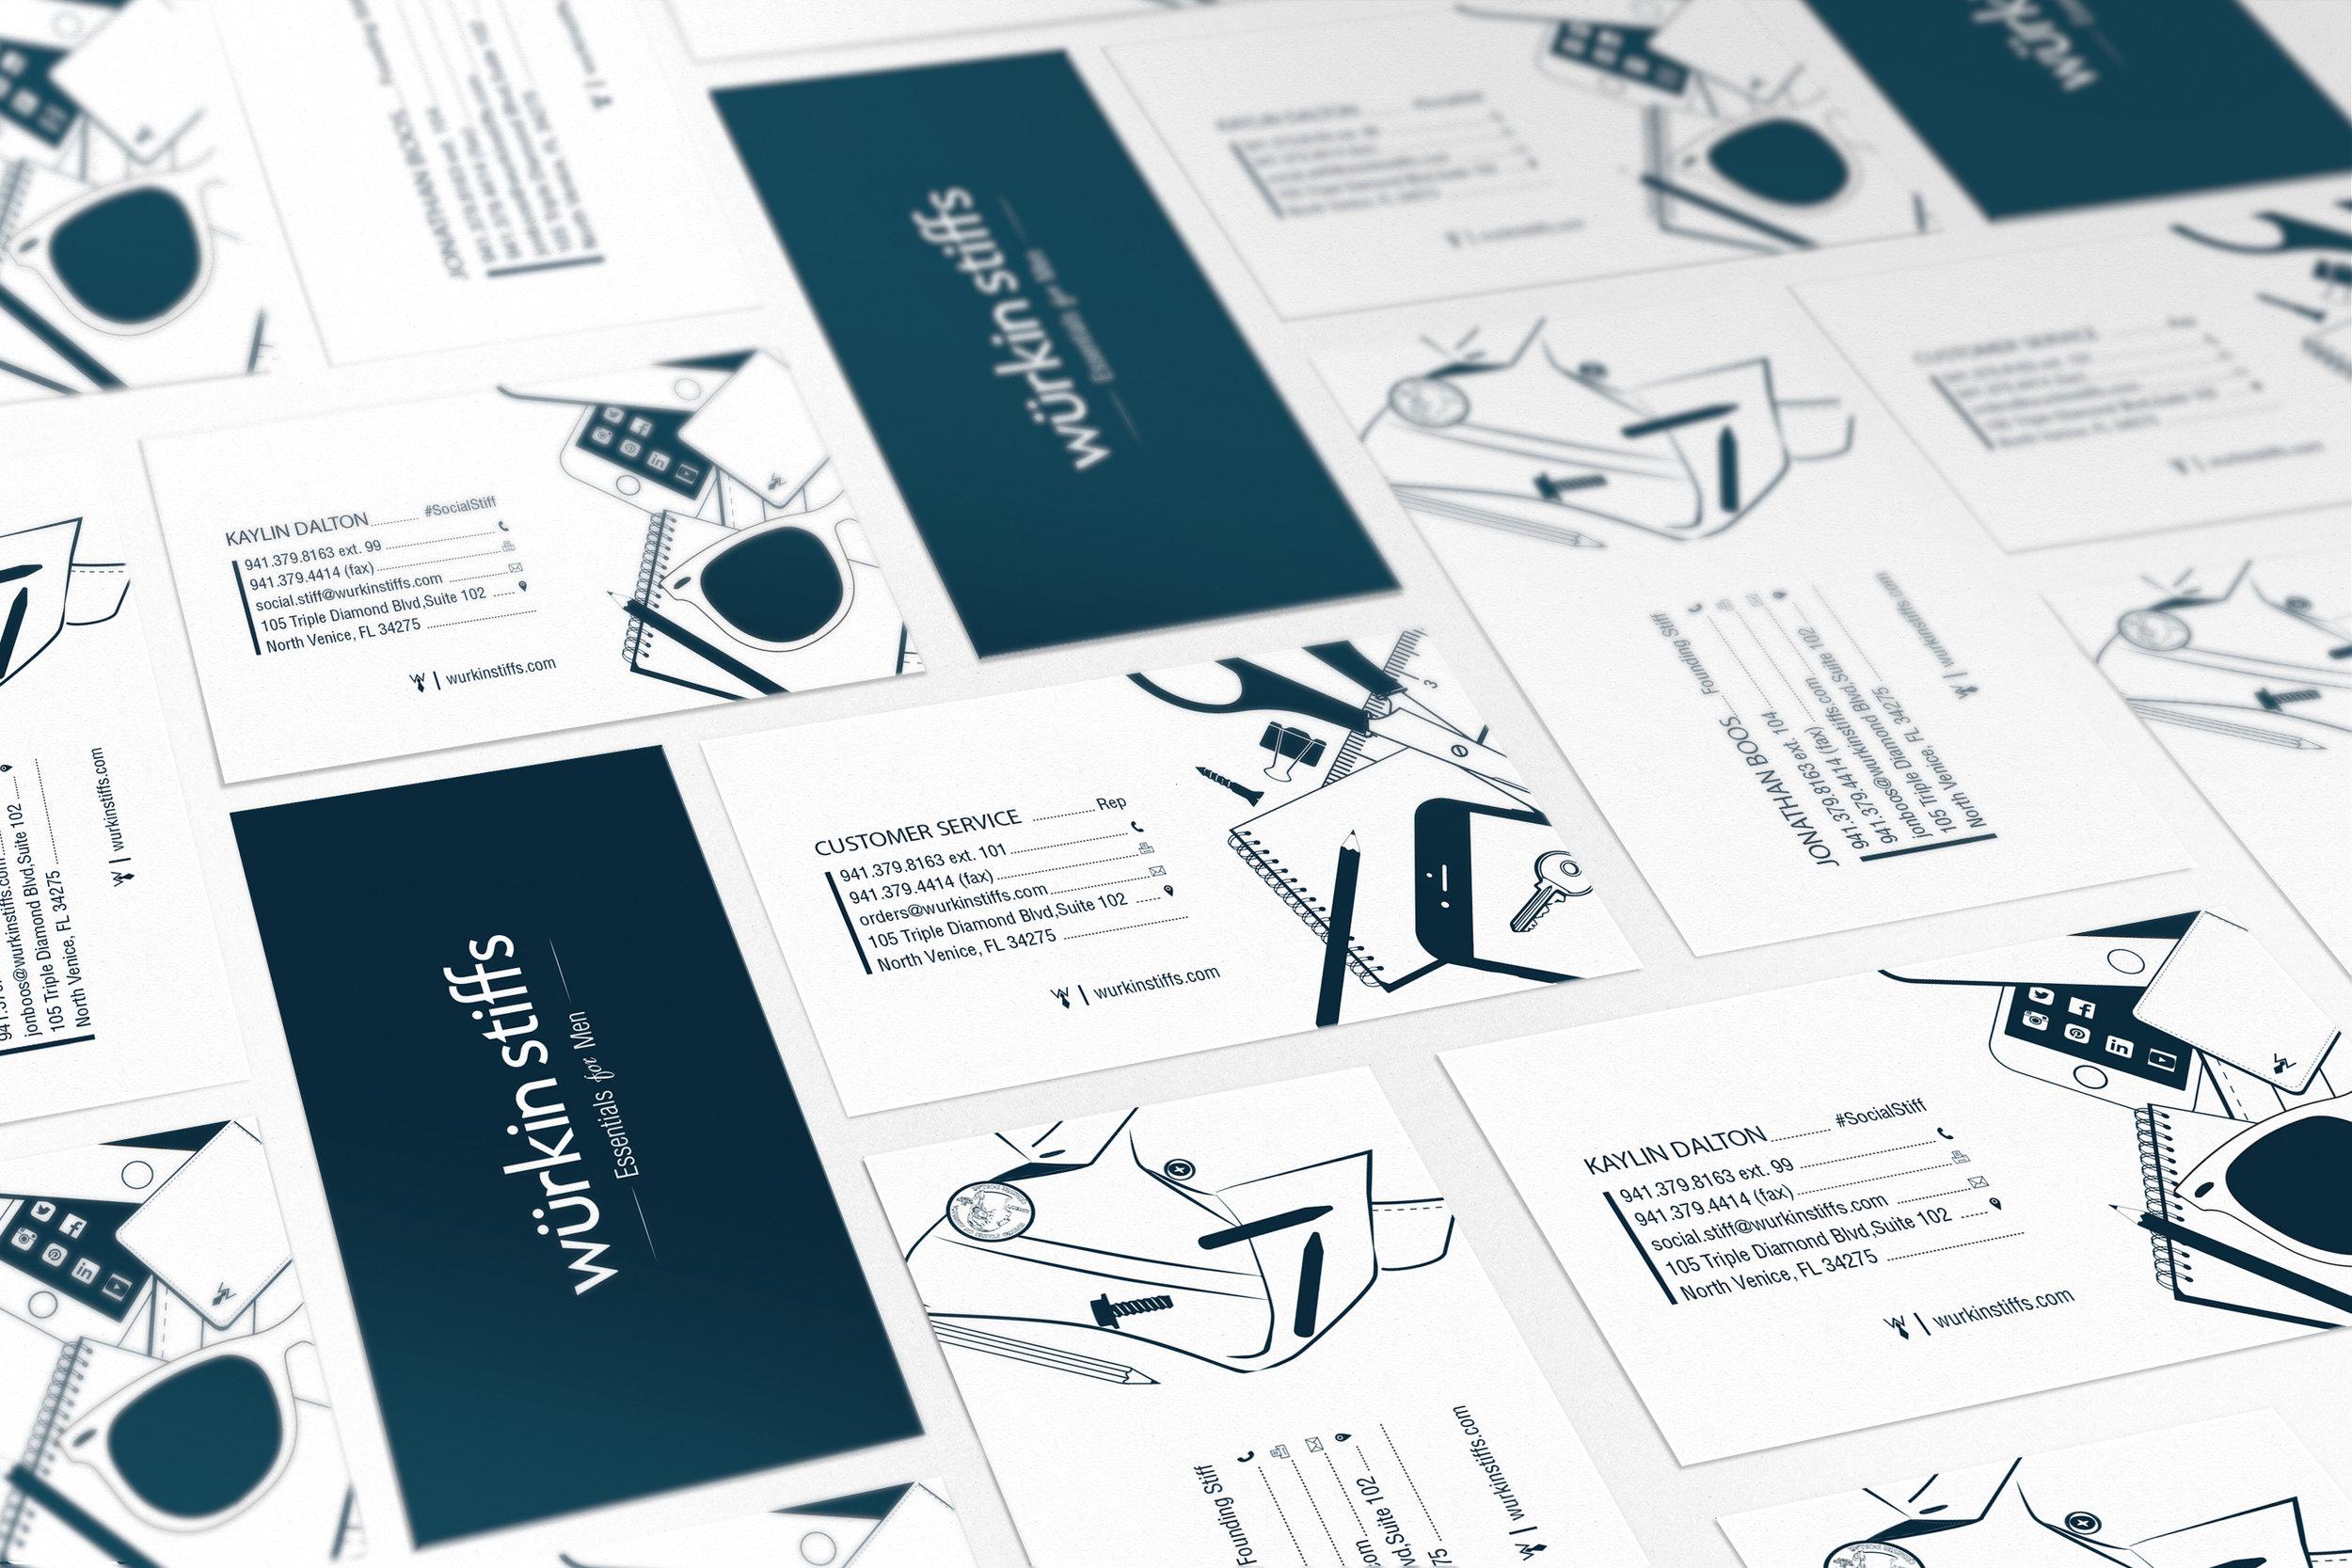 Business_Card_Assortment_Mockup.jpg